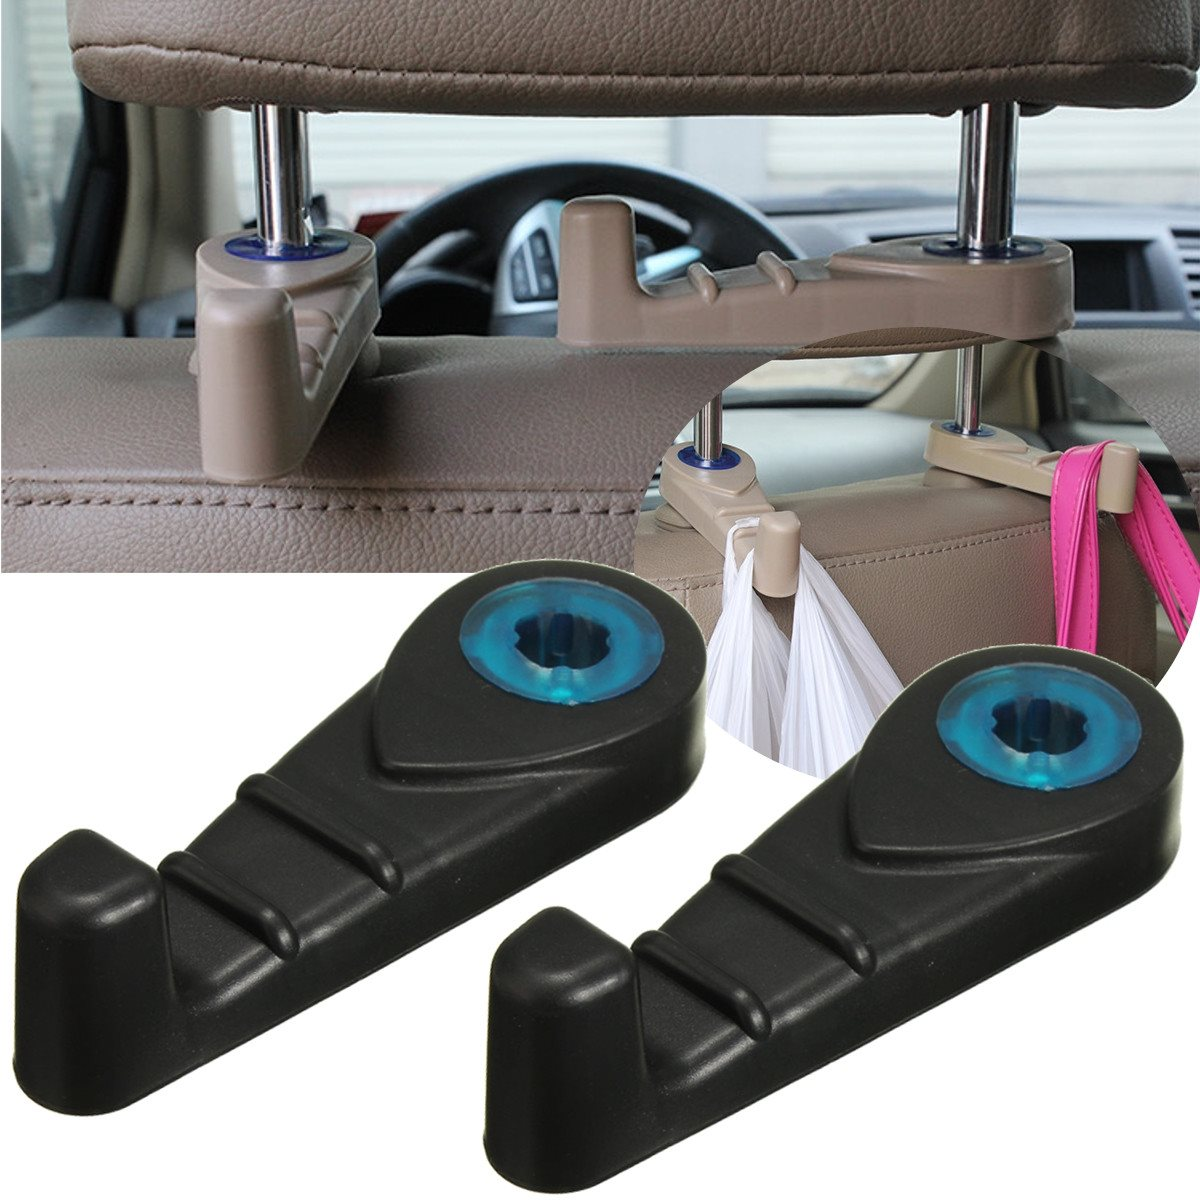 new 2x universal car back seat headrest luggage purse bags hanger hook holder black in auto. Black Bedroom Furniture Sets. Home Design Ideas